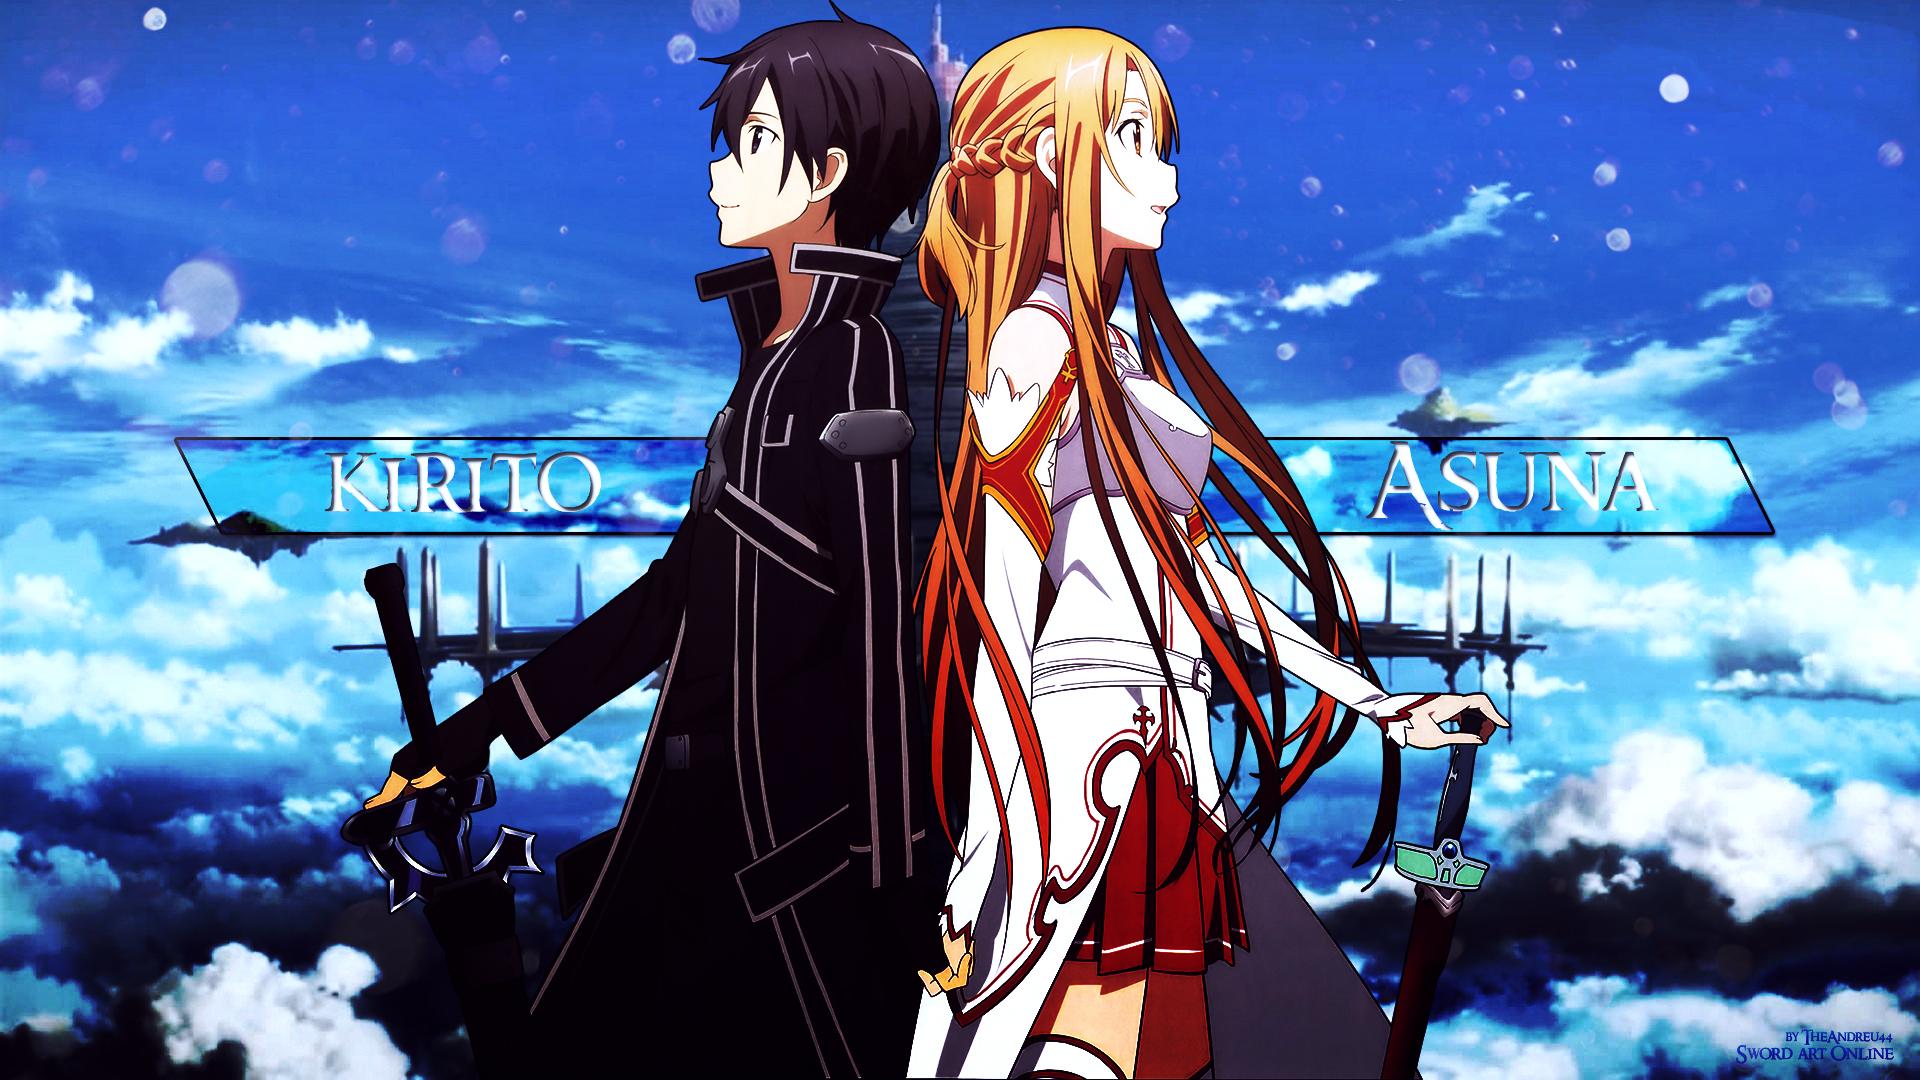 Sword Art Online Kirito And Asuna Wallpaper By Theandreu44 On